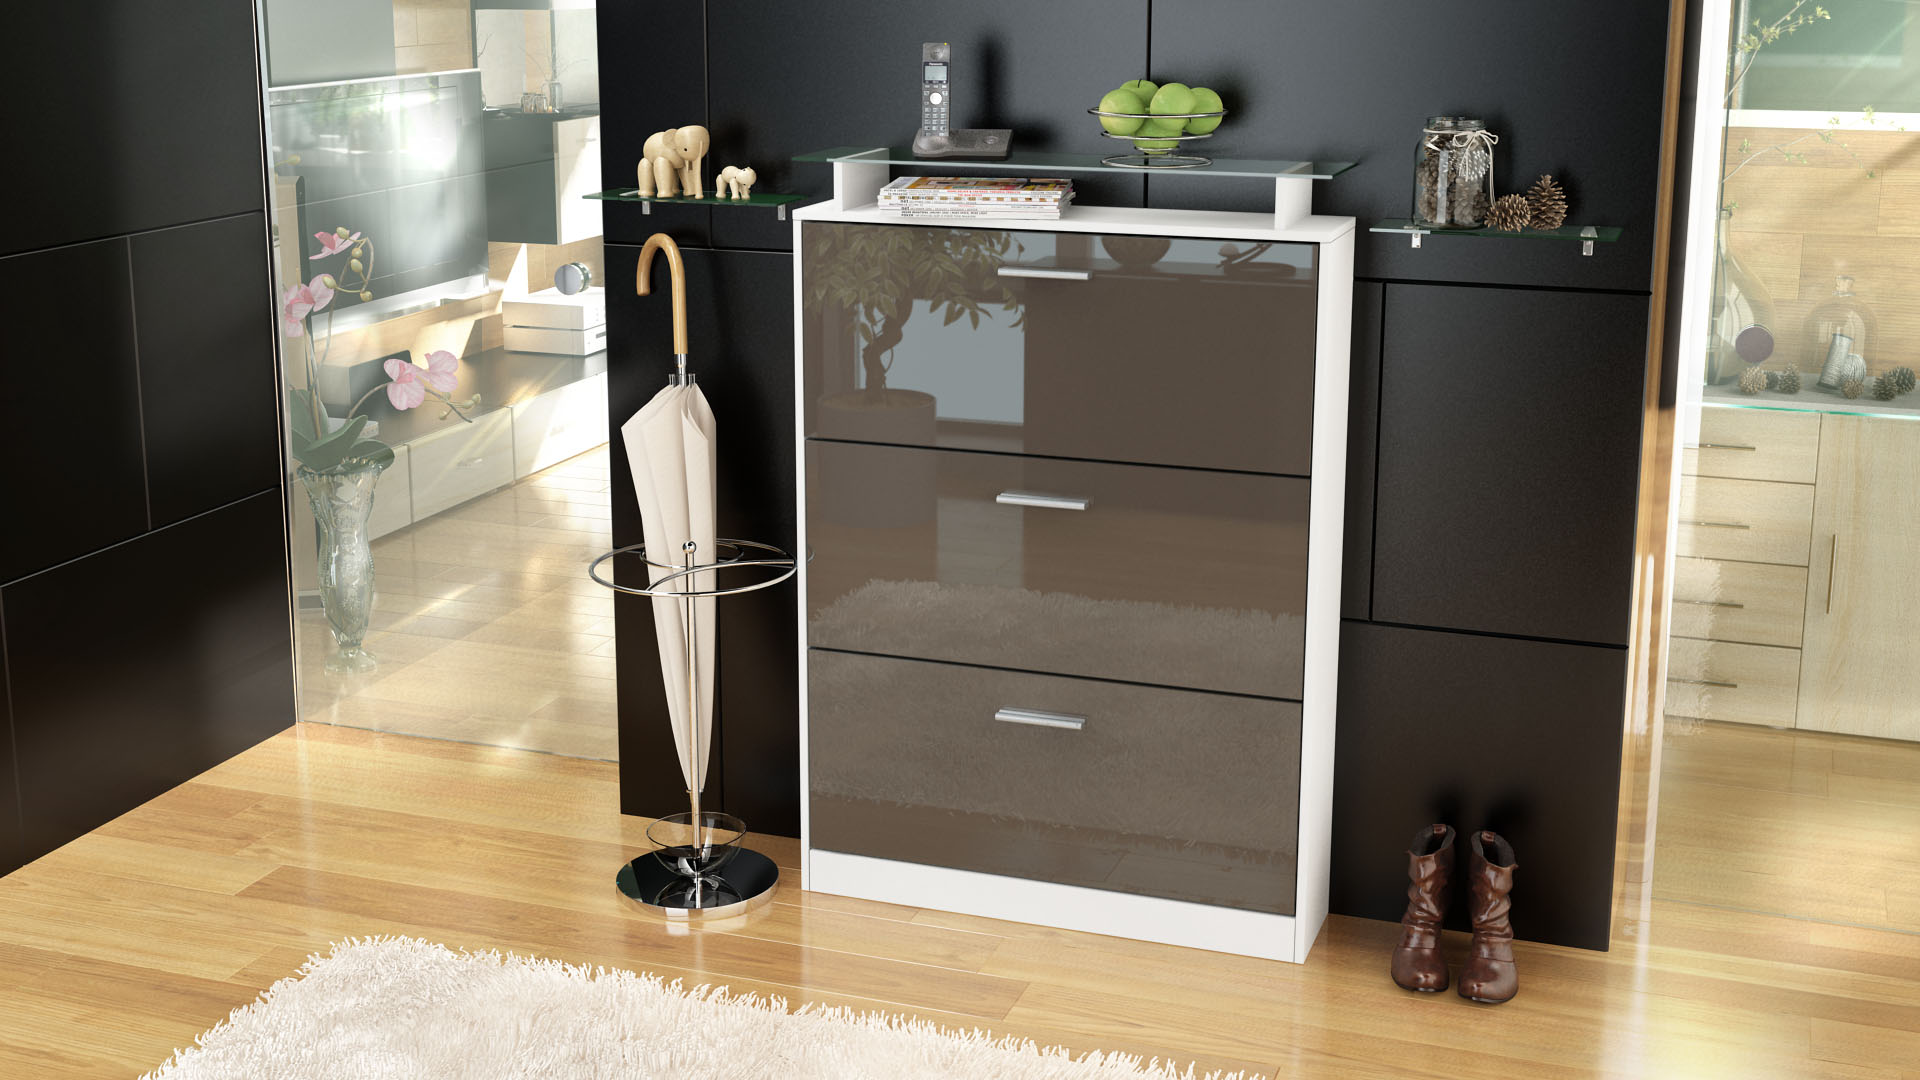 schuhschrank schuhkipper diele flur schrank lavia wei hochglanz naturt ne ebay. Black Bedroom Furniture Sets. Home Design Ideas